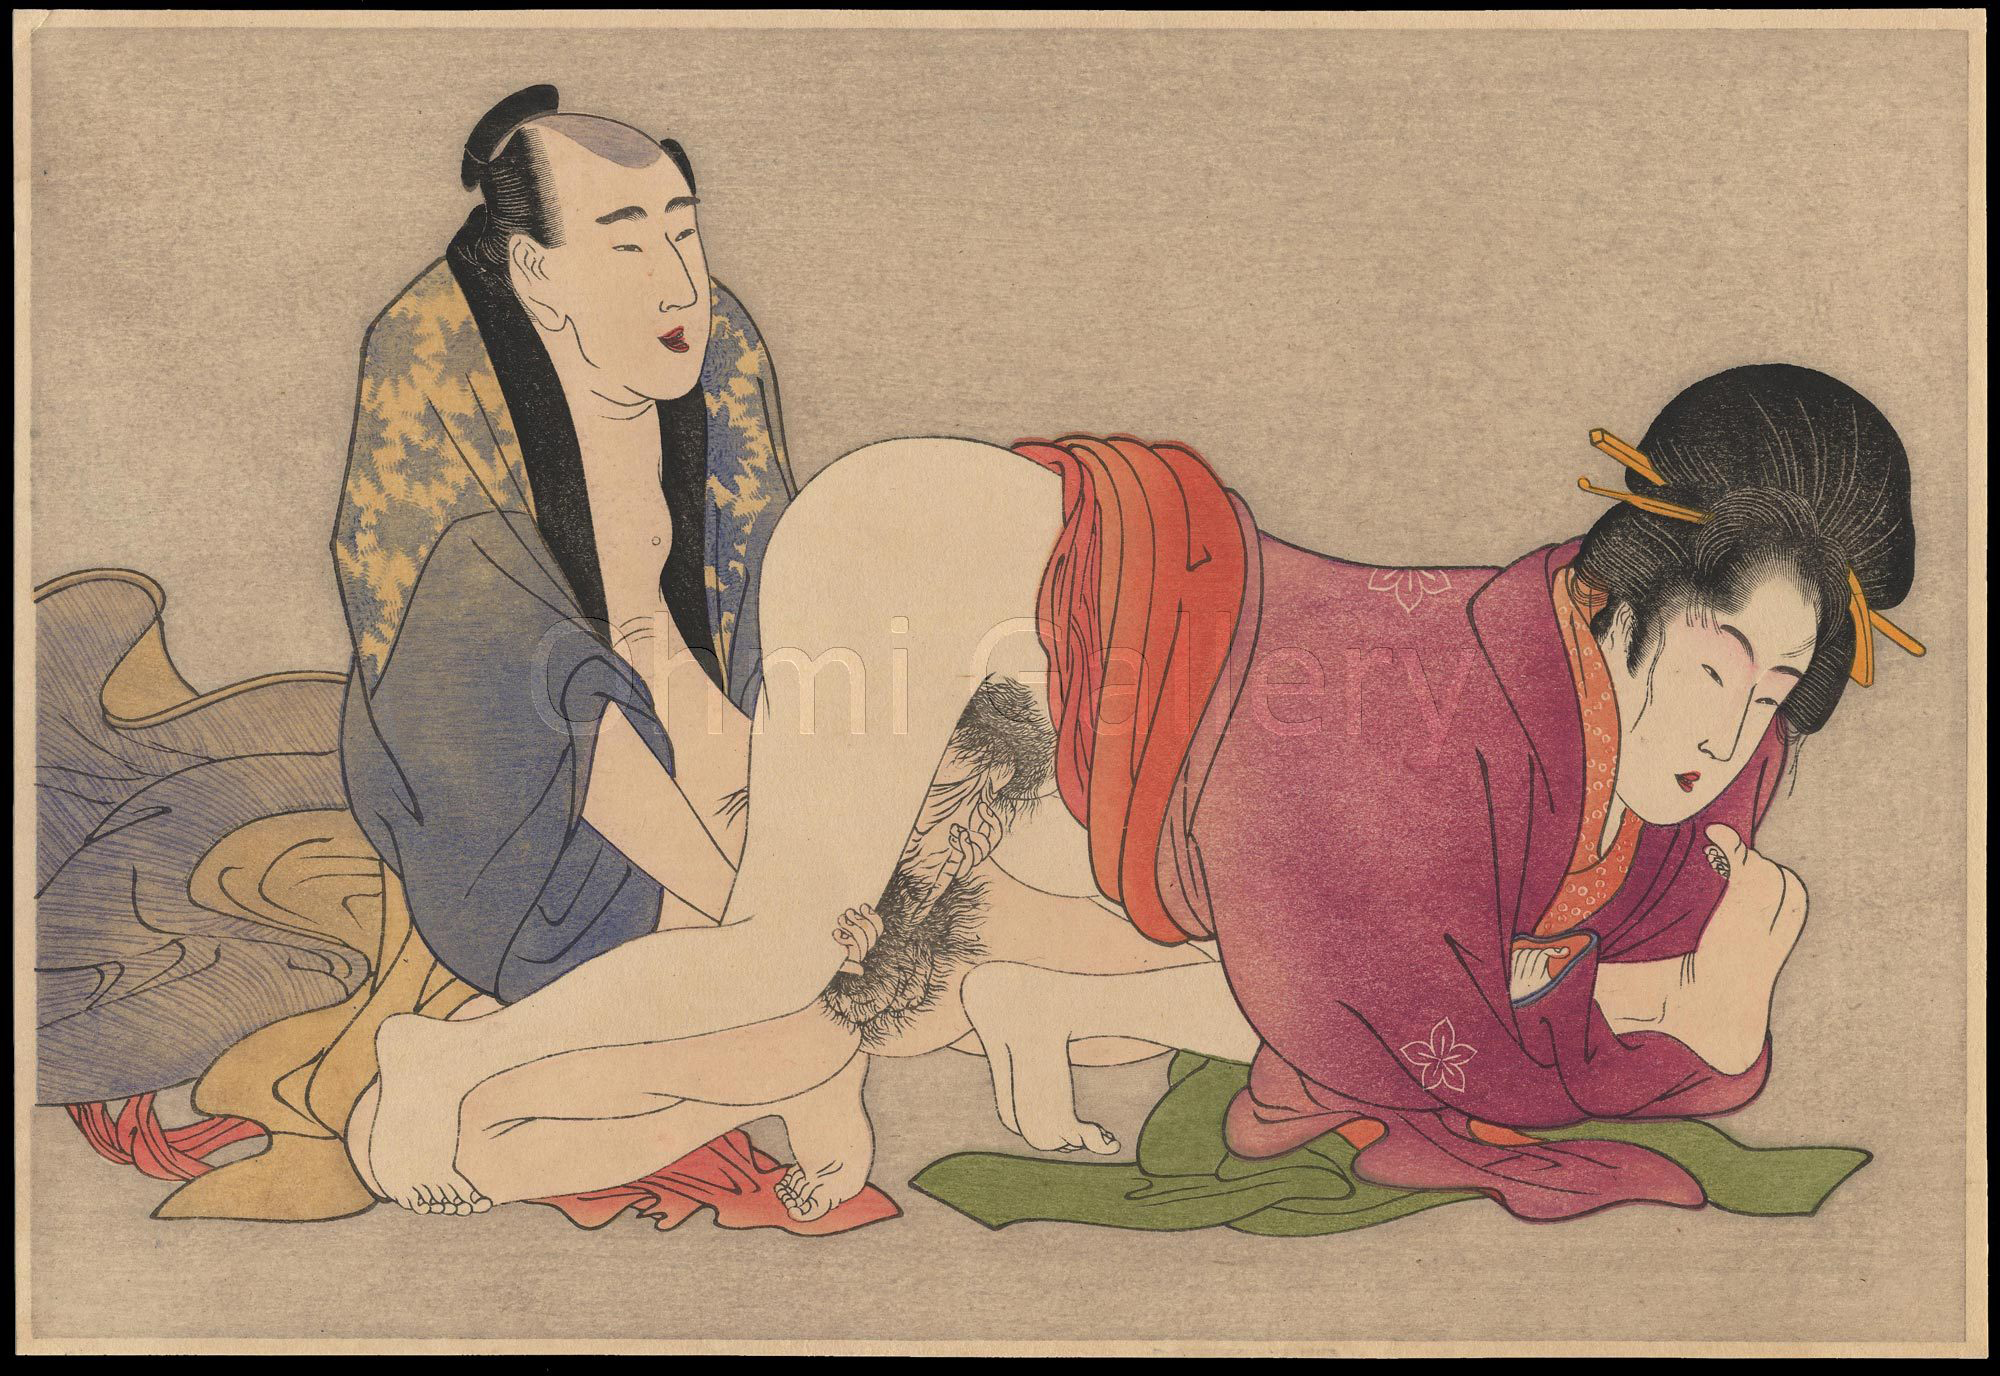 Shunga 1780Japanese term for erotic art